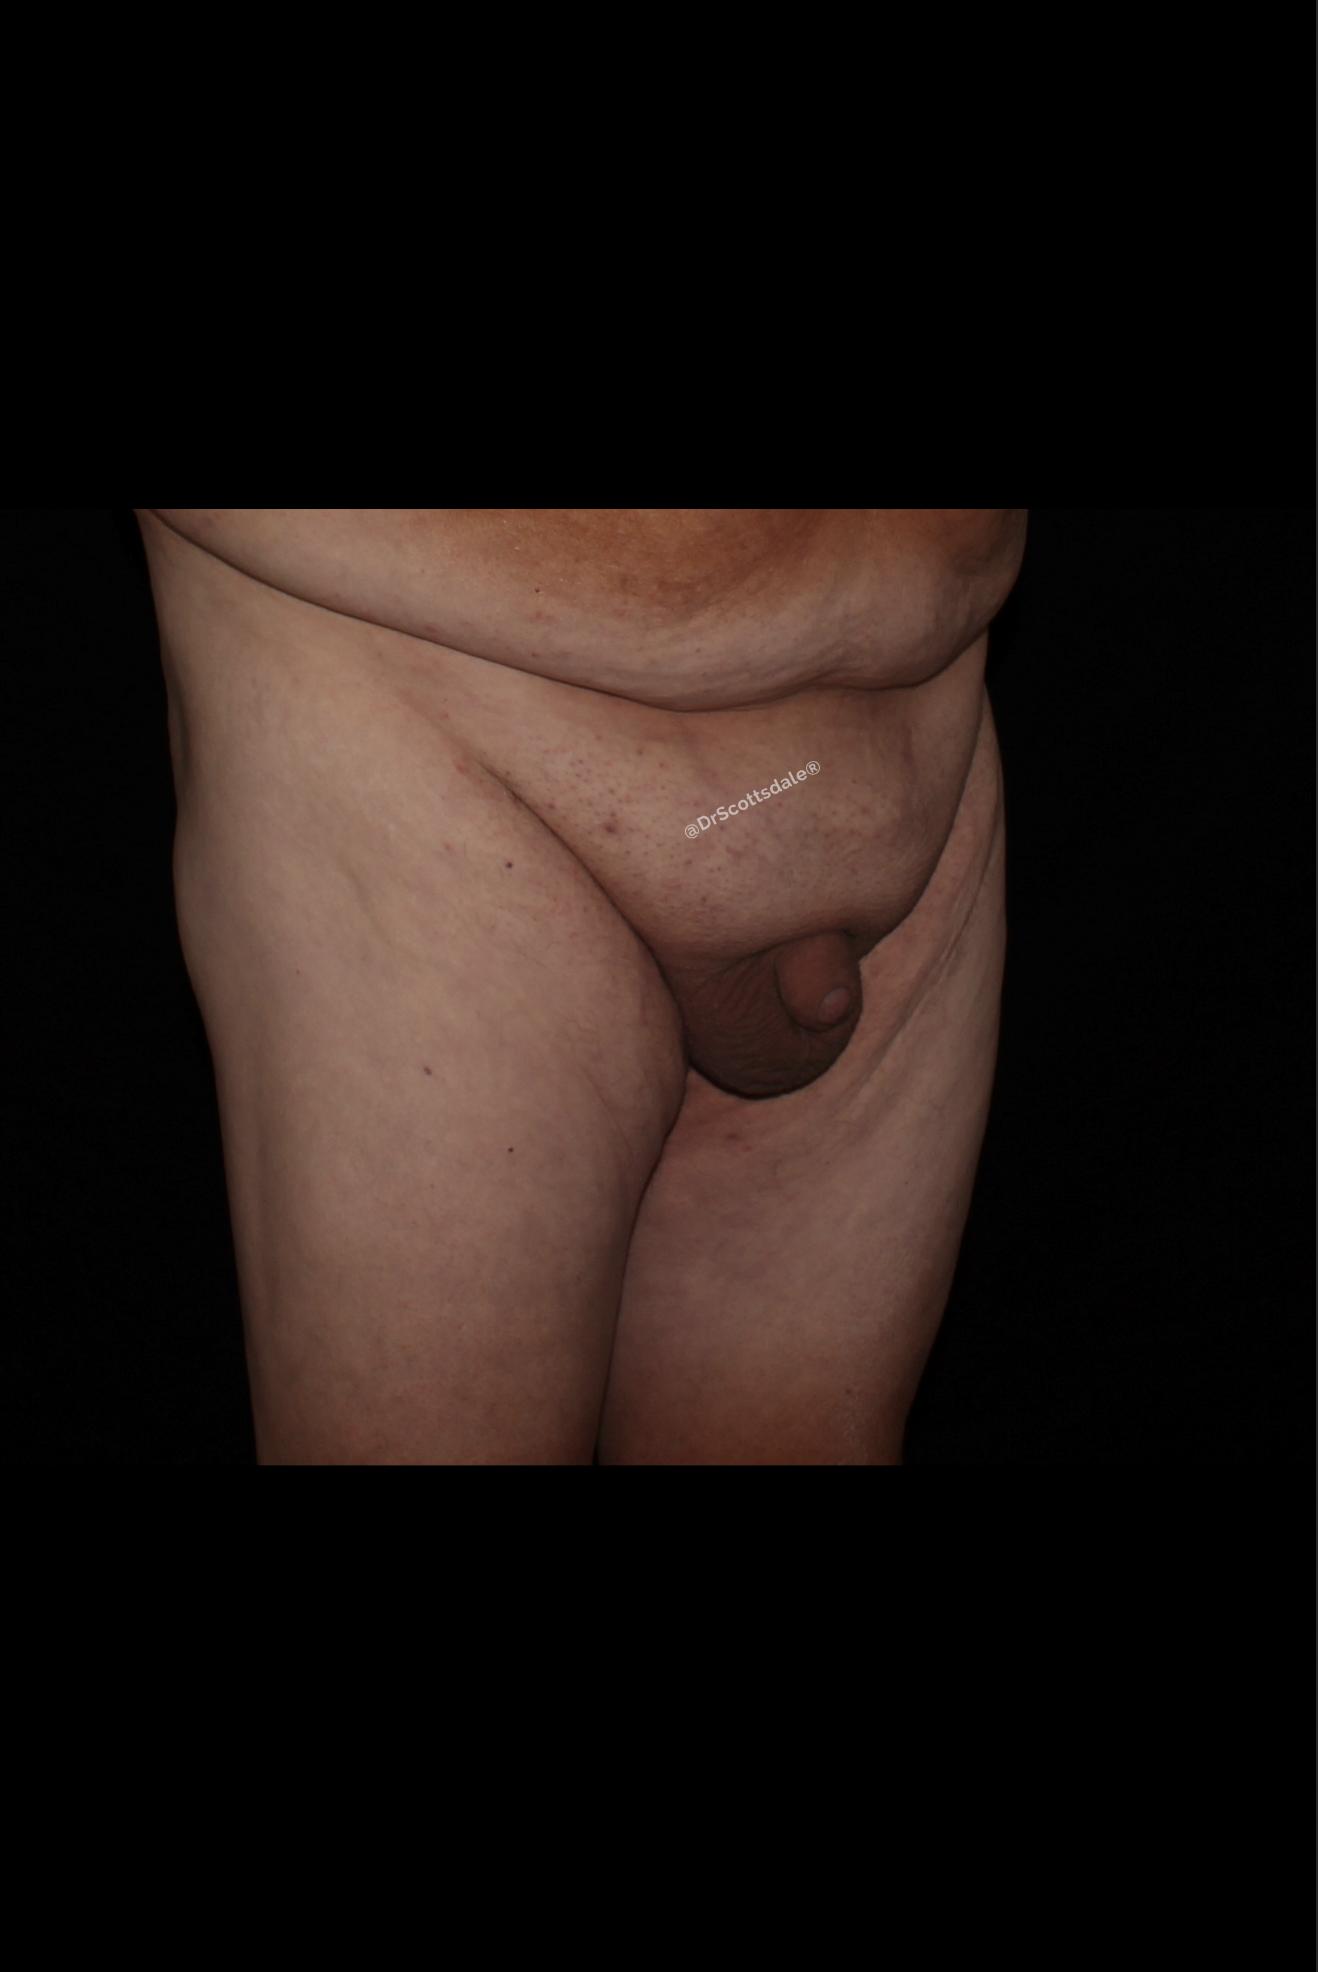 Before Male Enhancement - Monsplasty & Tummy Tuck